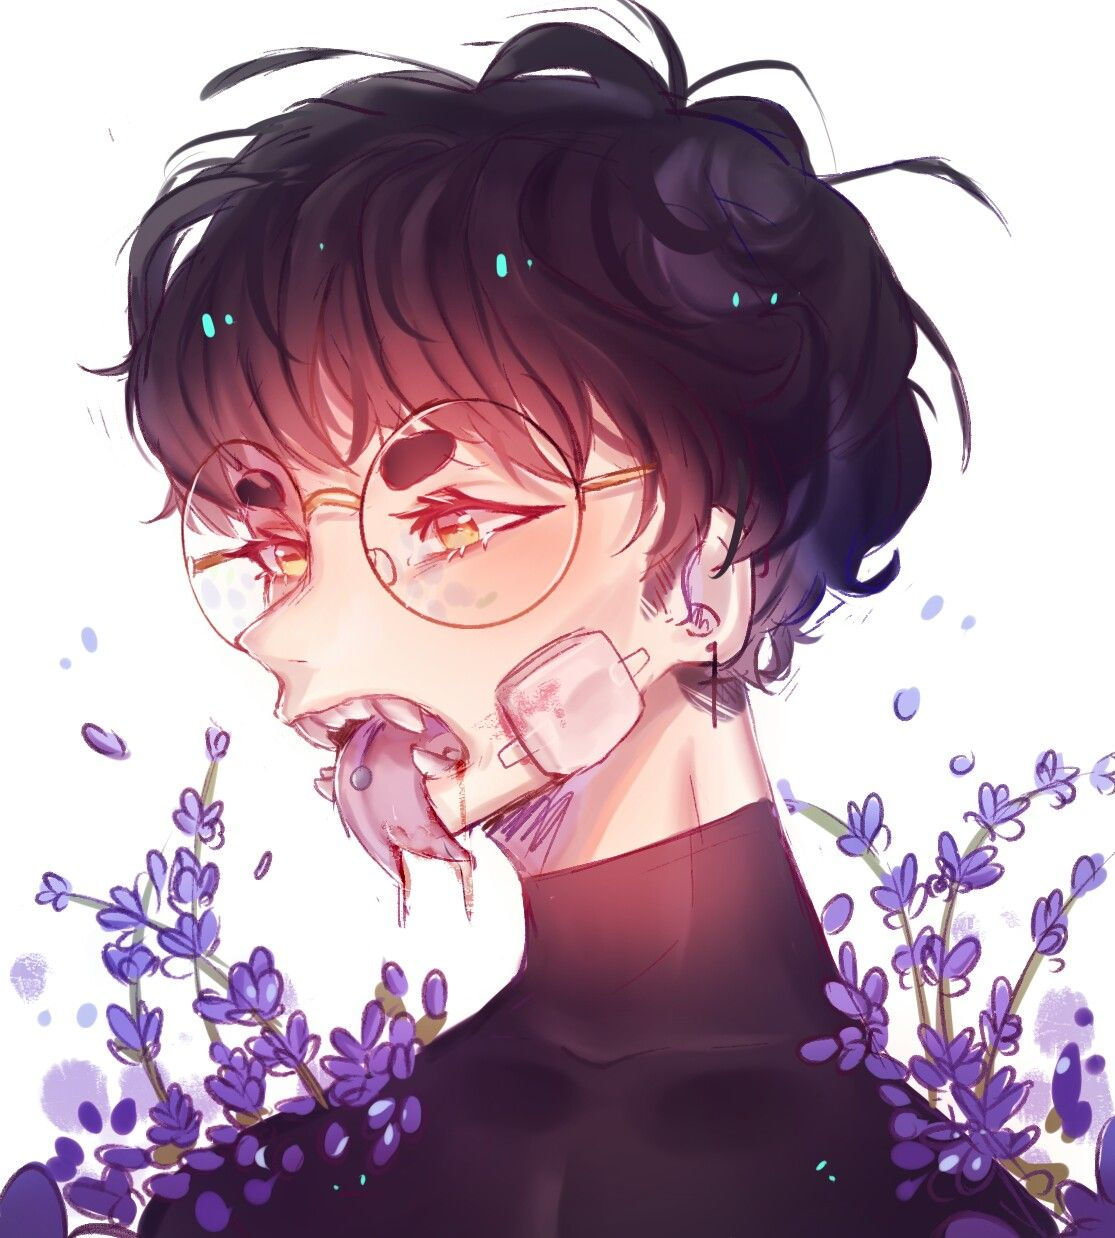 Cute Aesthetic Anime Boy Pfp